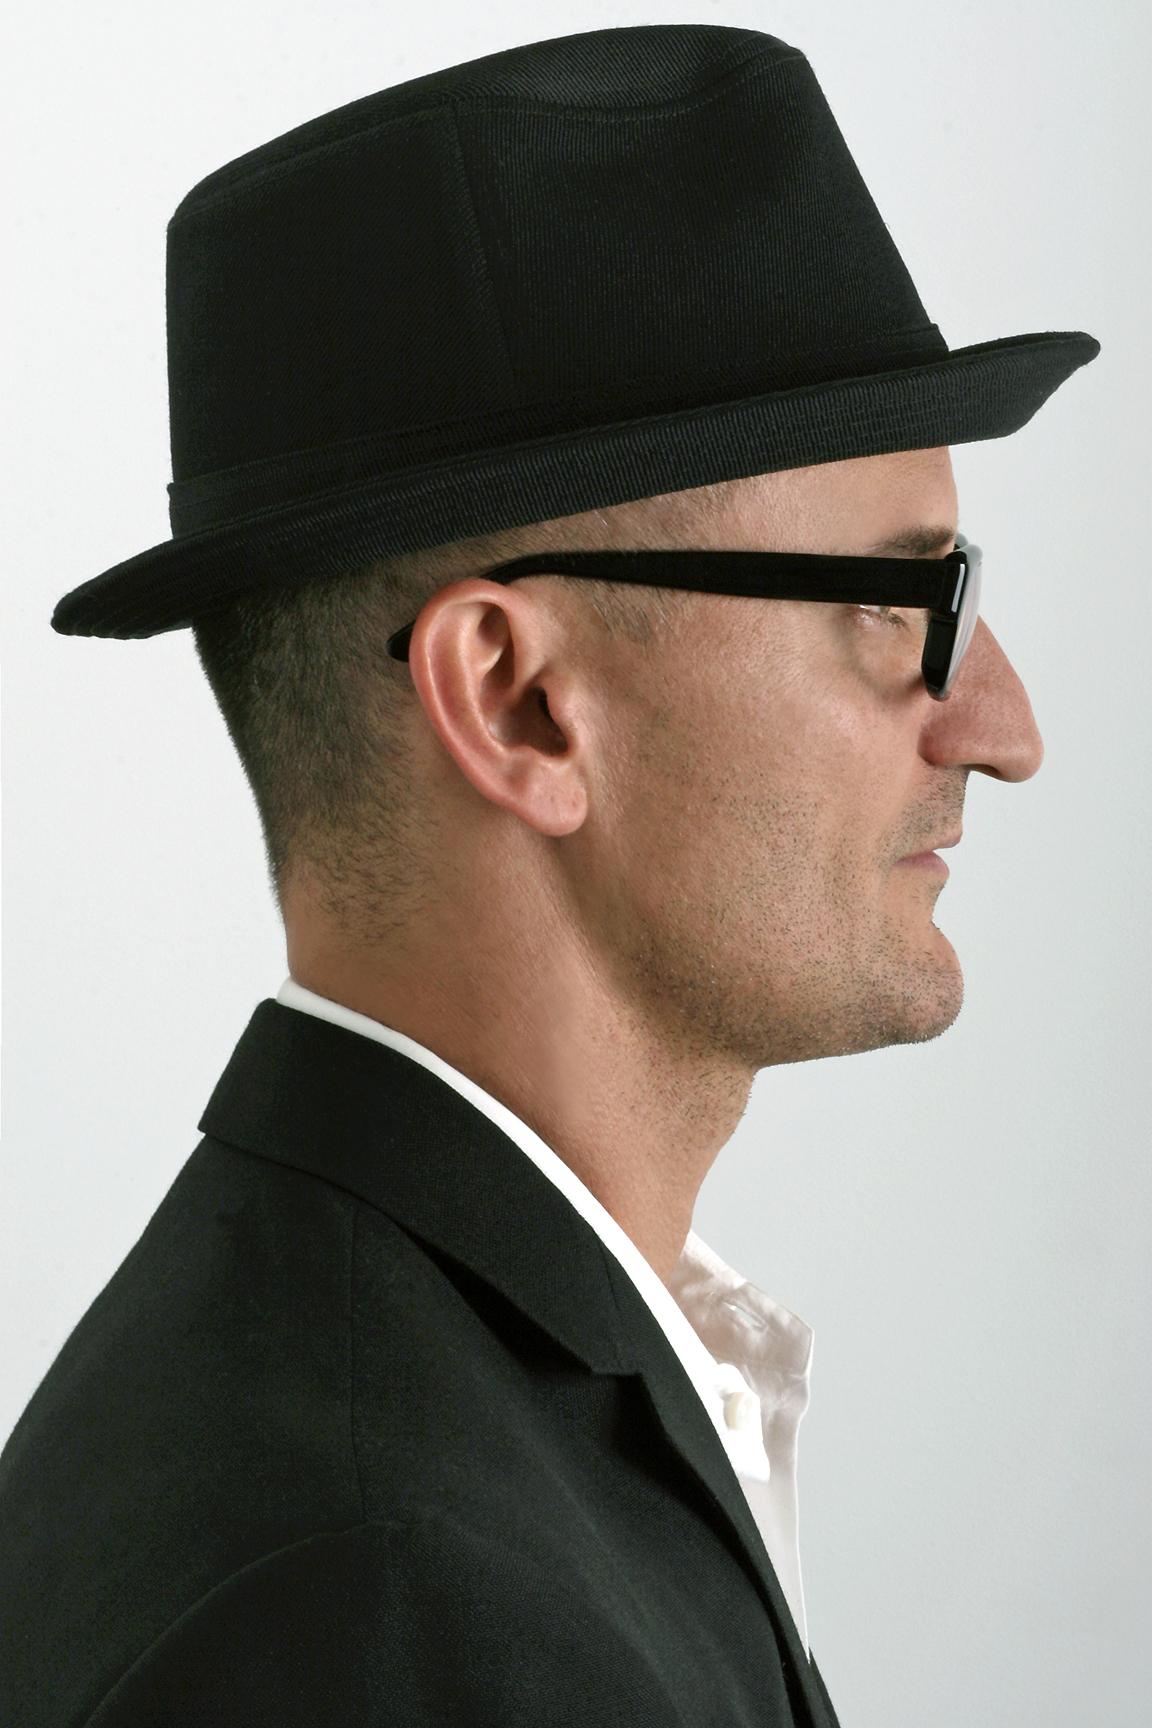 Mark Carrasquillo